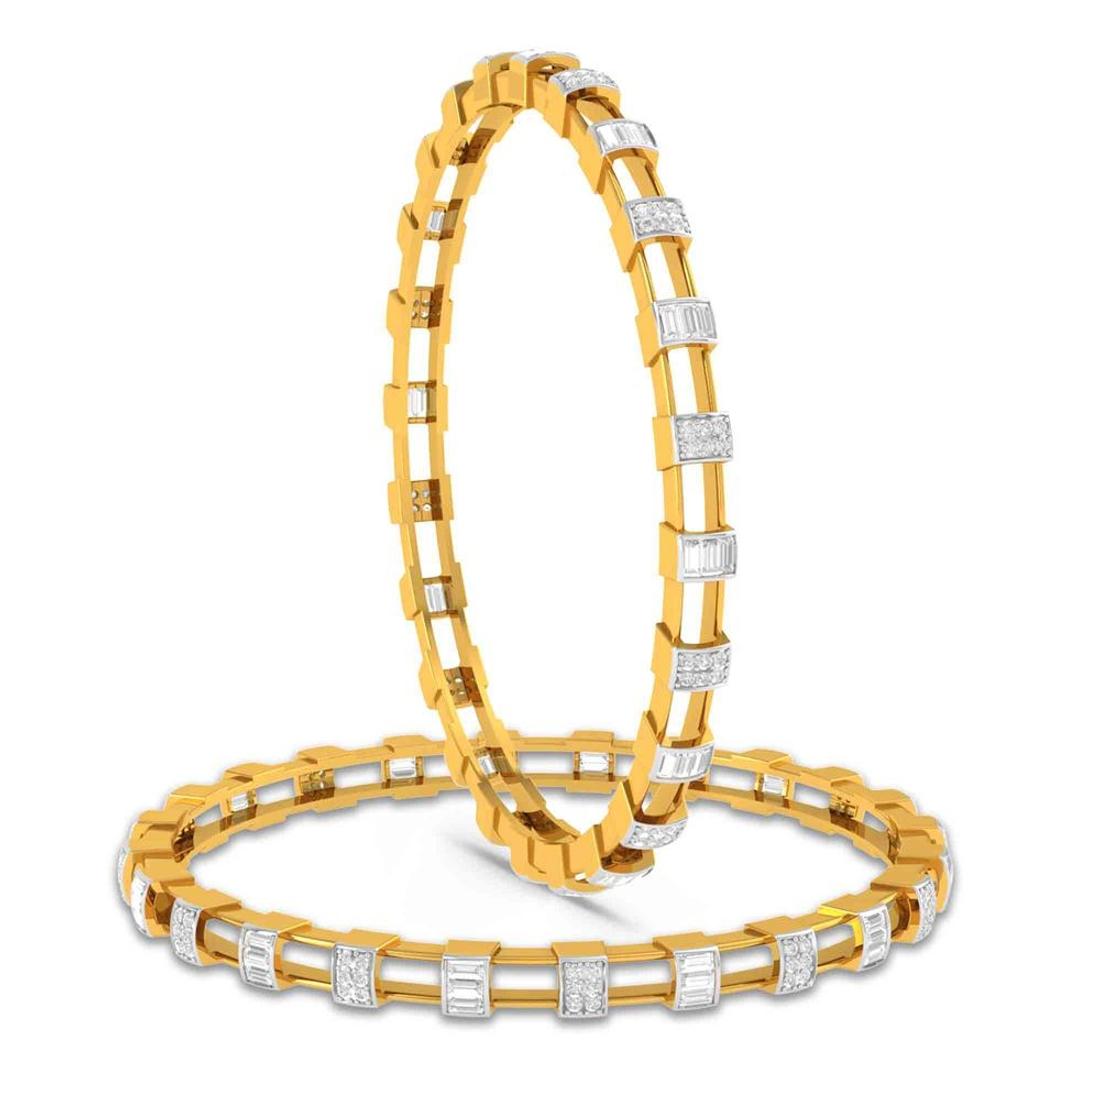 Charu Jewels Diamond Bangle Made with 37.70  Gms 18 KT Yellow Gold Gold And 2.27 Carat Diamonds